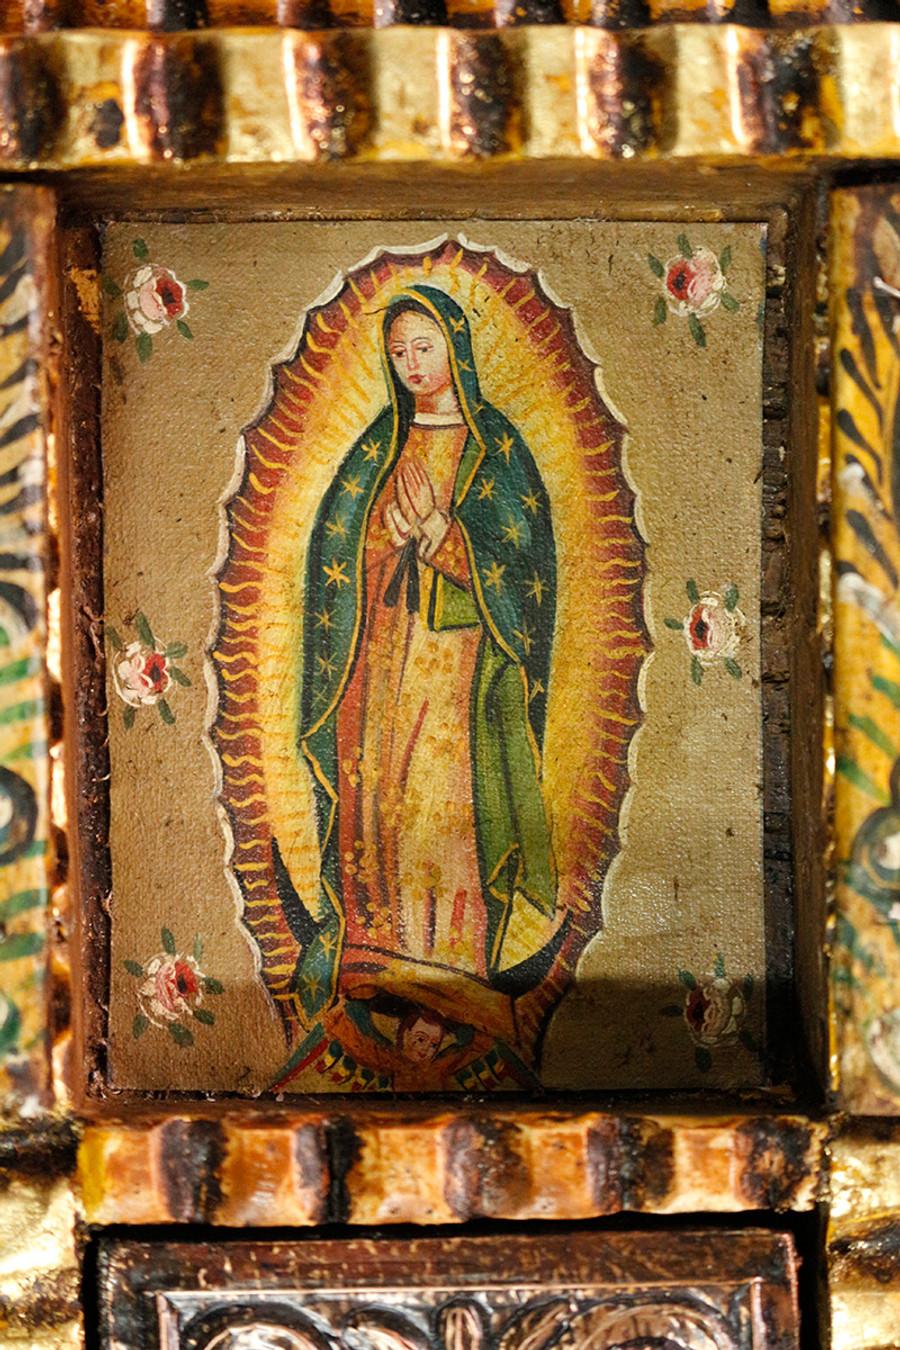 Guadalupe Virgin Colonial Peru Art Handmade Retablo Handcarved Altarpiece (4575)